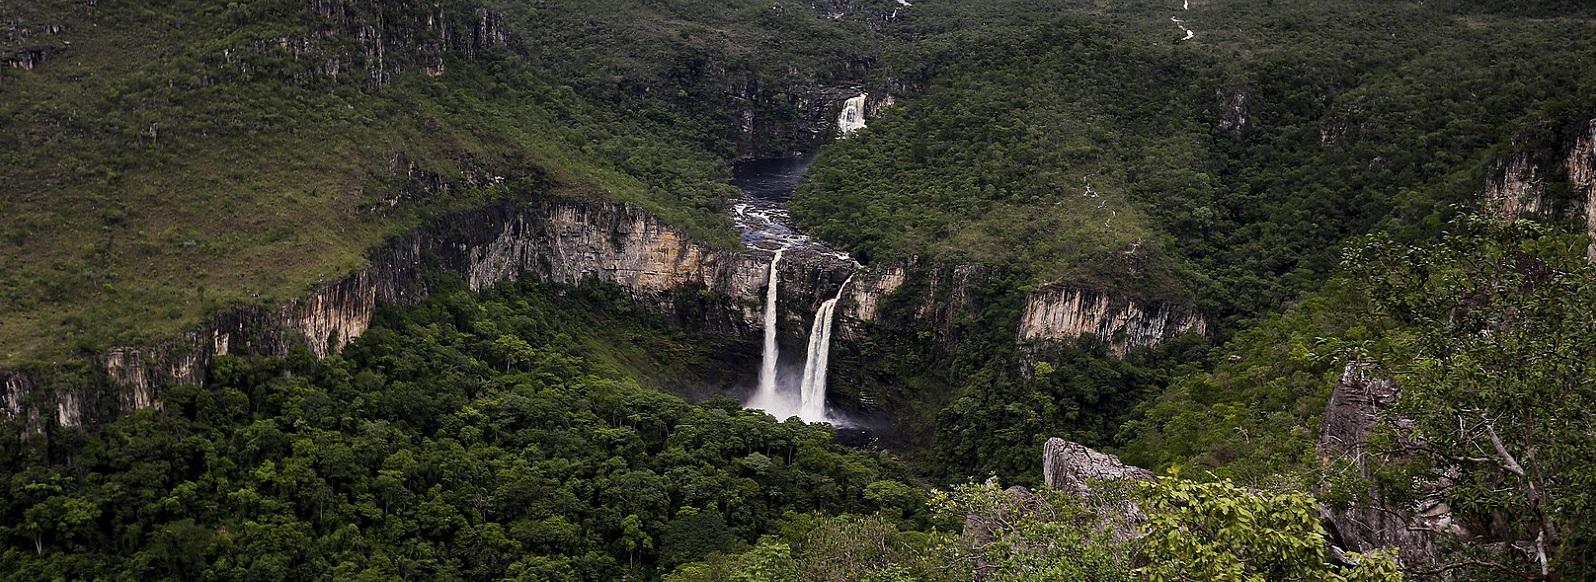 By Marcelo Camargo/Agência Brasil - http://agenciabrasil.ebc.com.br/geral/foto/2016-12/parque-nacional-da-chapada-dos-veadeiros-i, CC BY 3.0 br, https://commons.wikimedia.org/w/index.php?curid=53947554